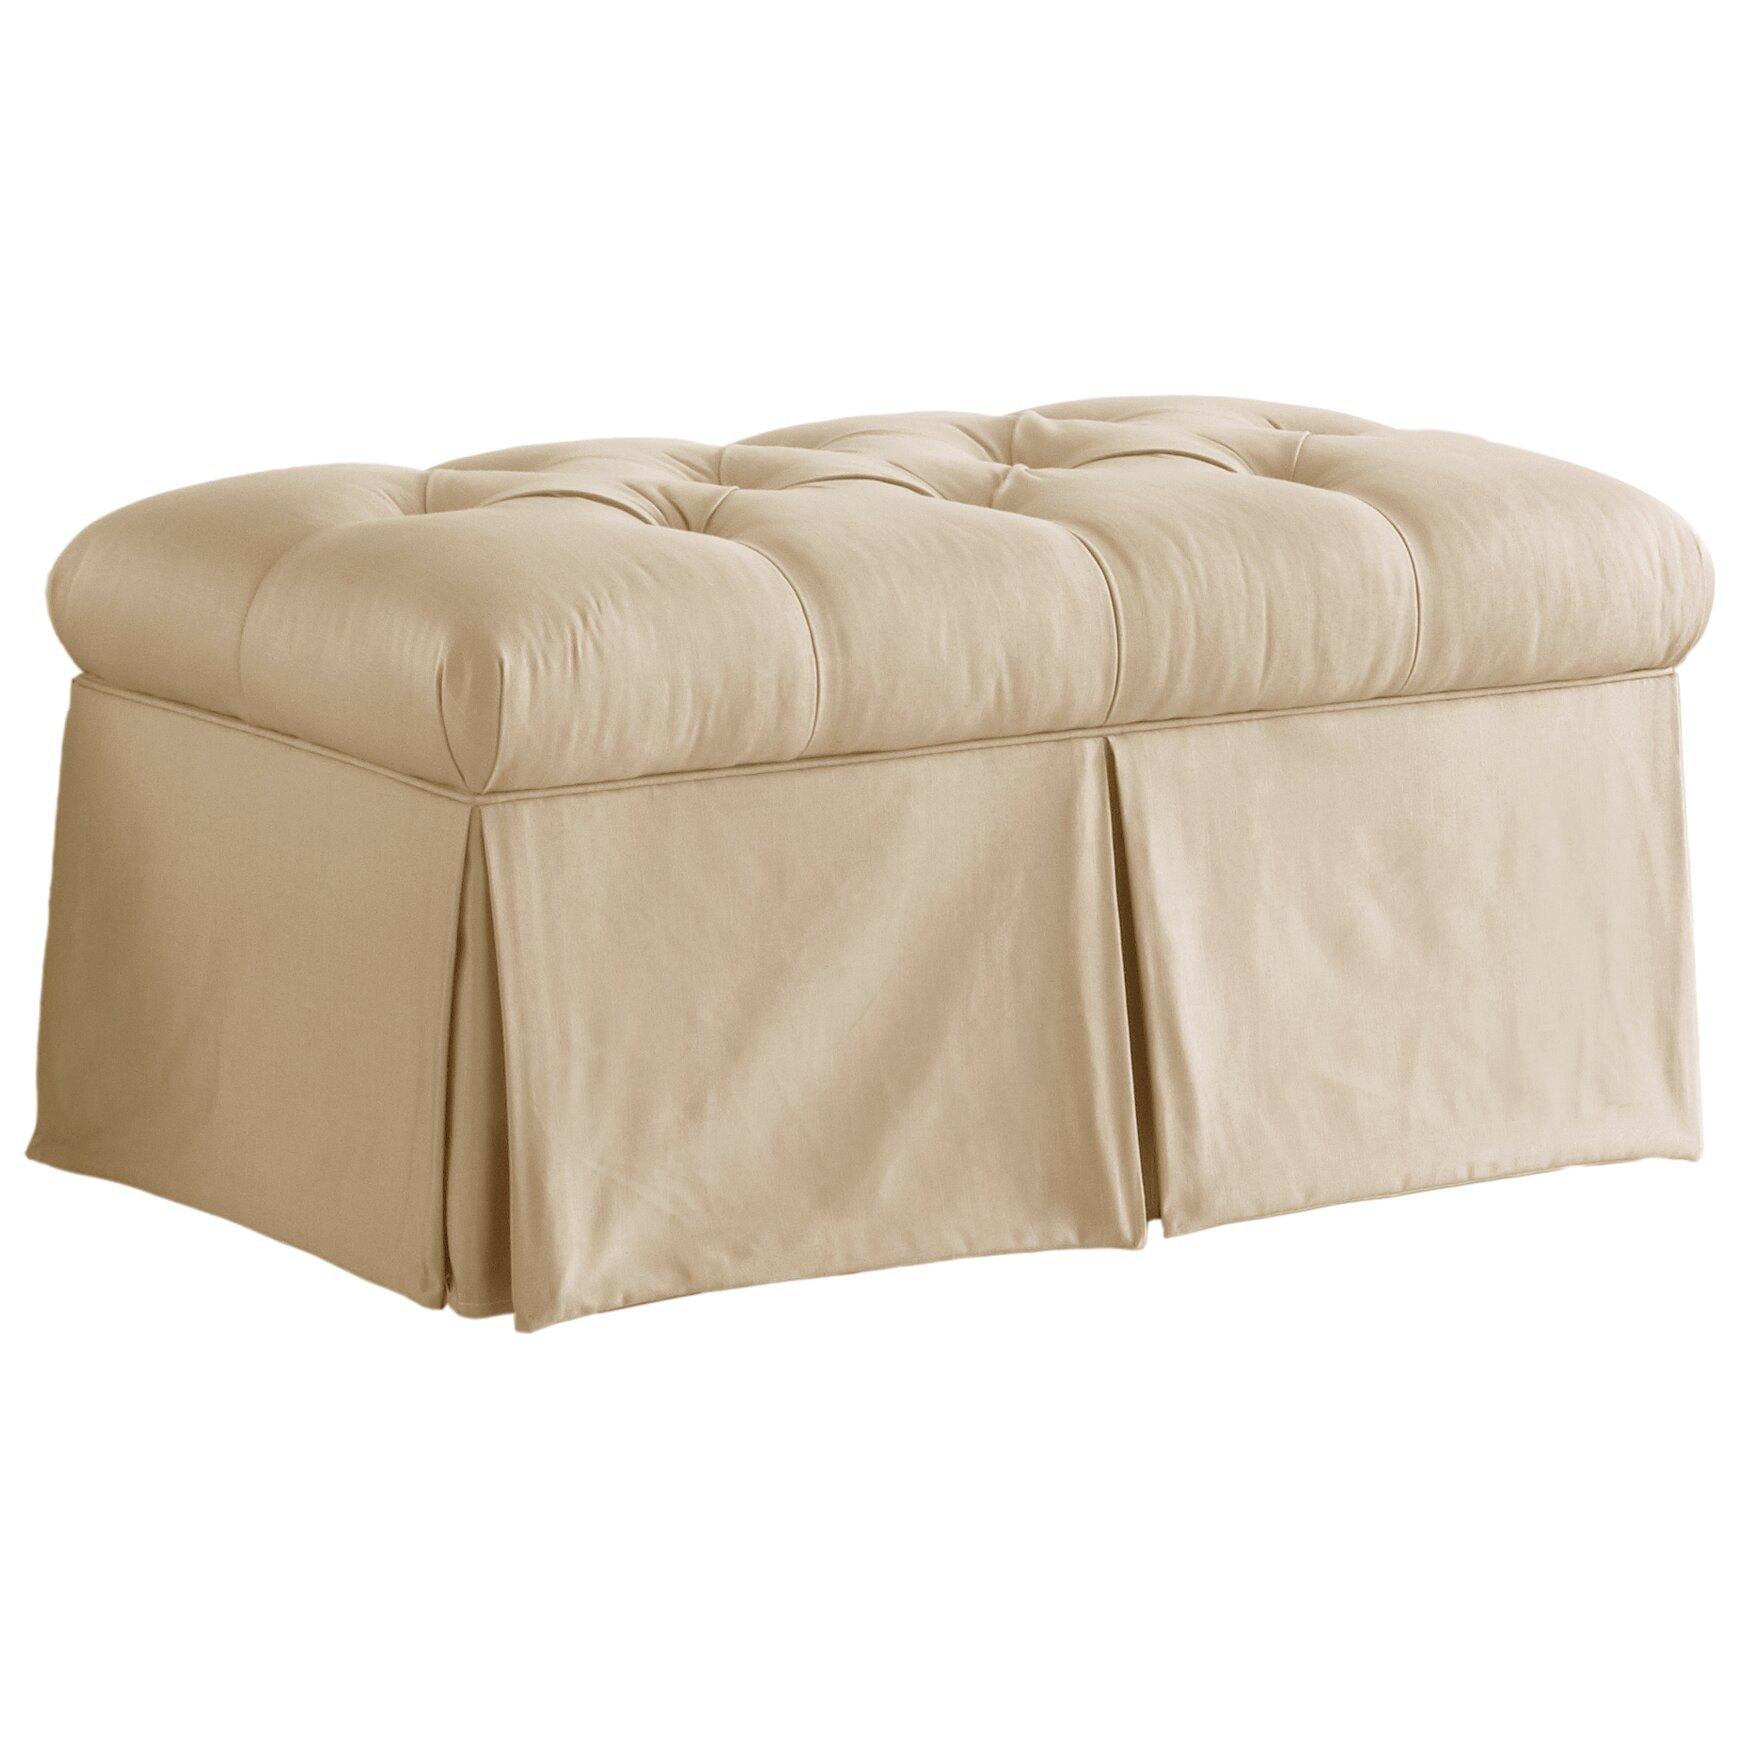 house of hampton cooper tufted upholstered microdenier storage bench reviews wayfair. Black Bedroom Furniture Sets. Home Design Ideas